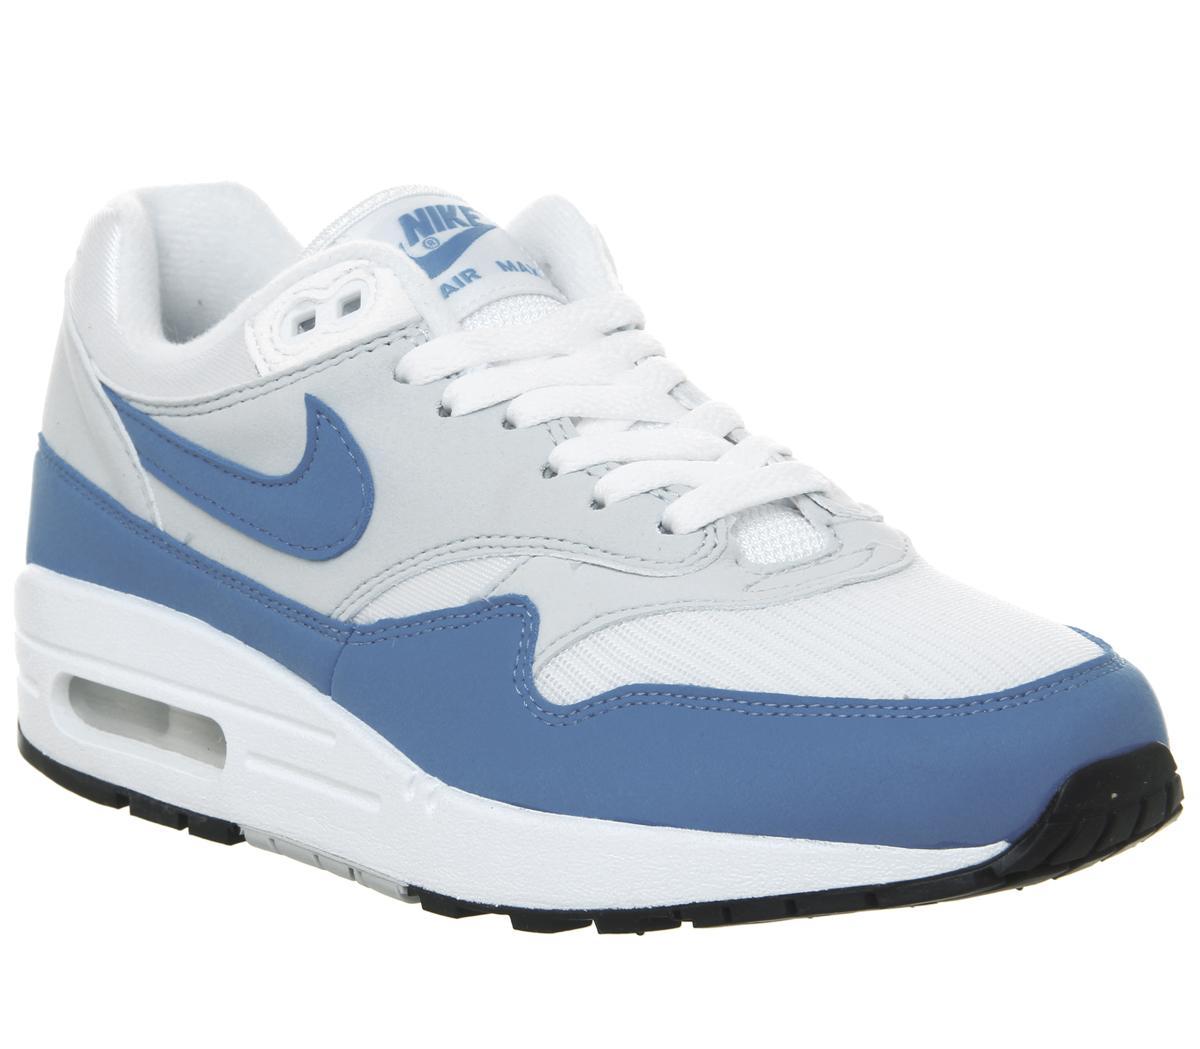 Nike Air Max 1 Trainers White